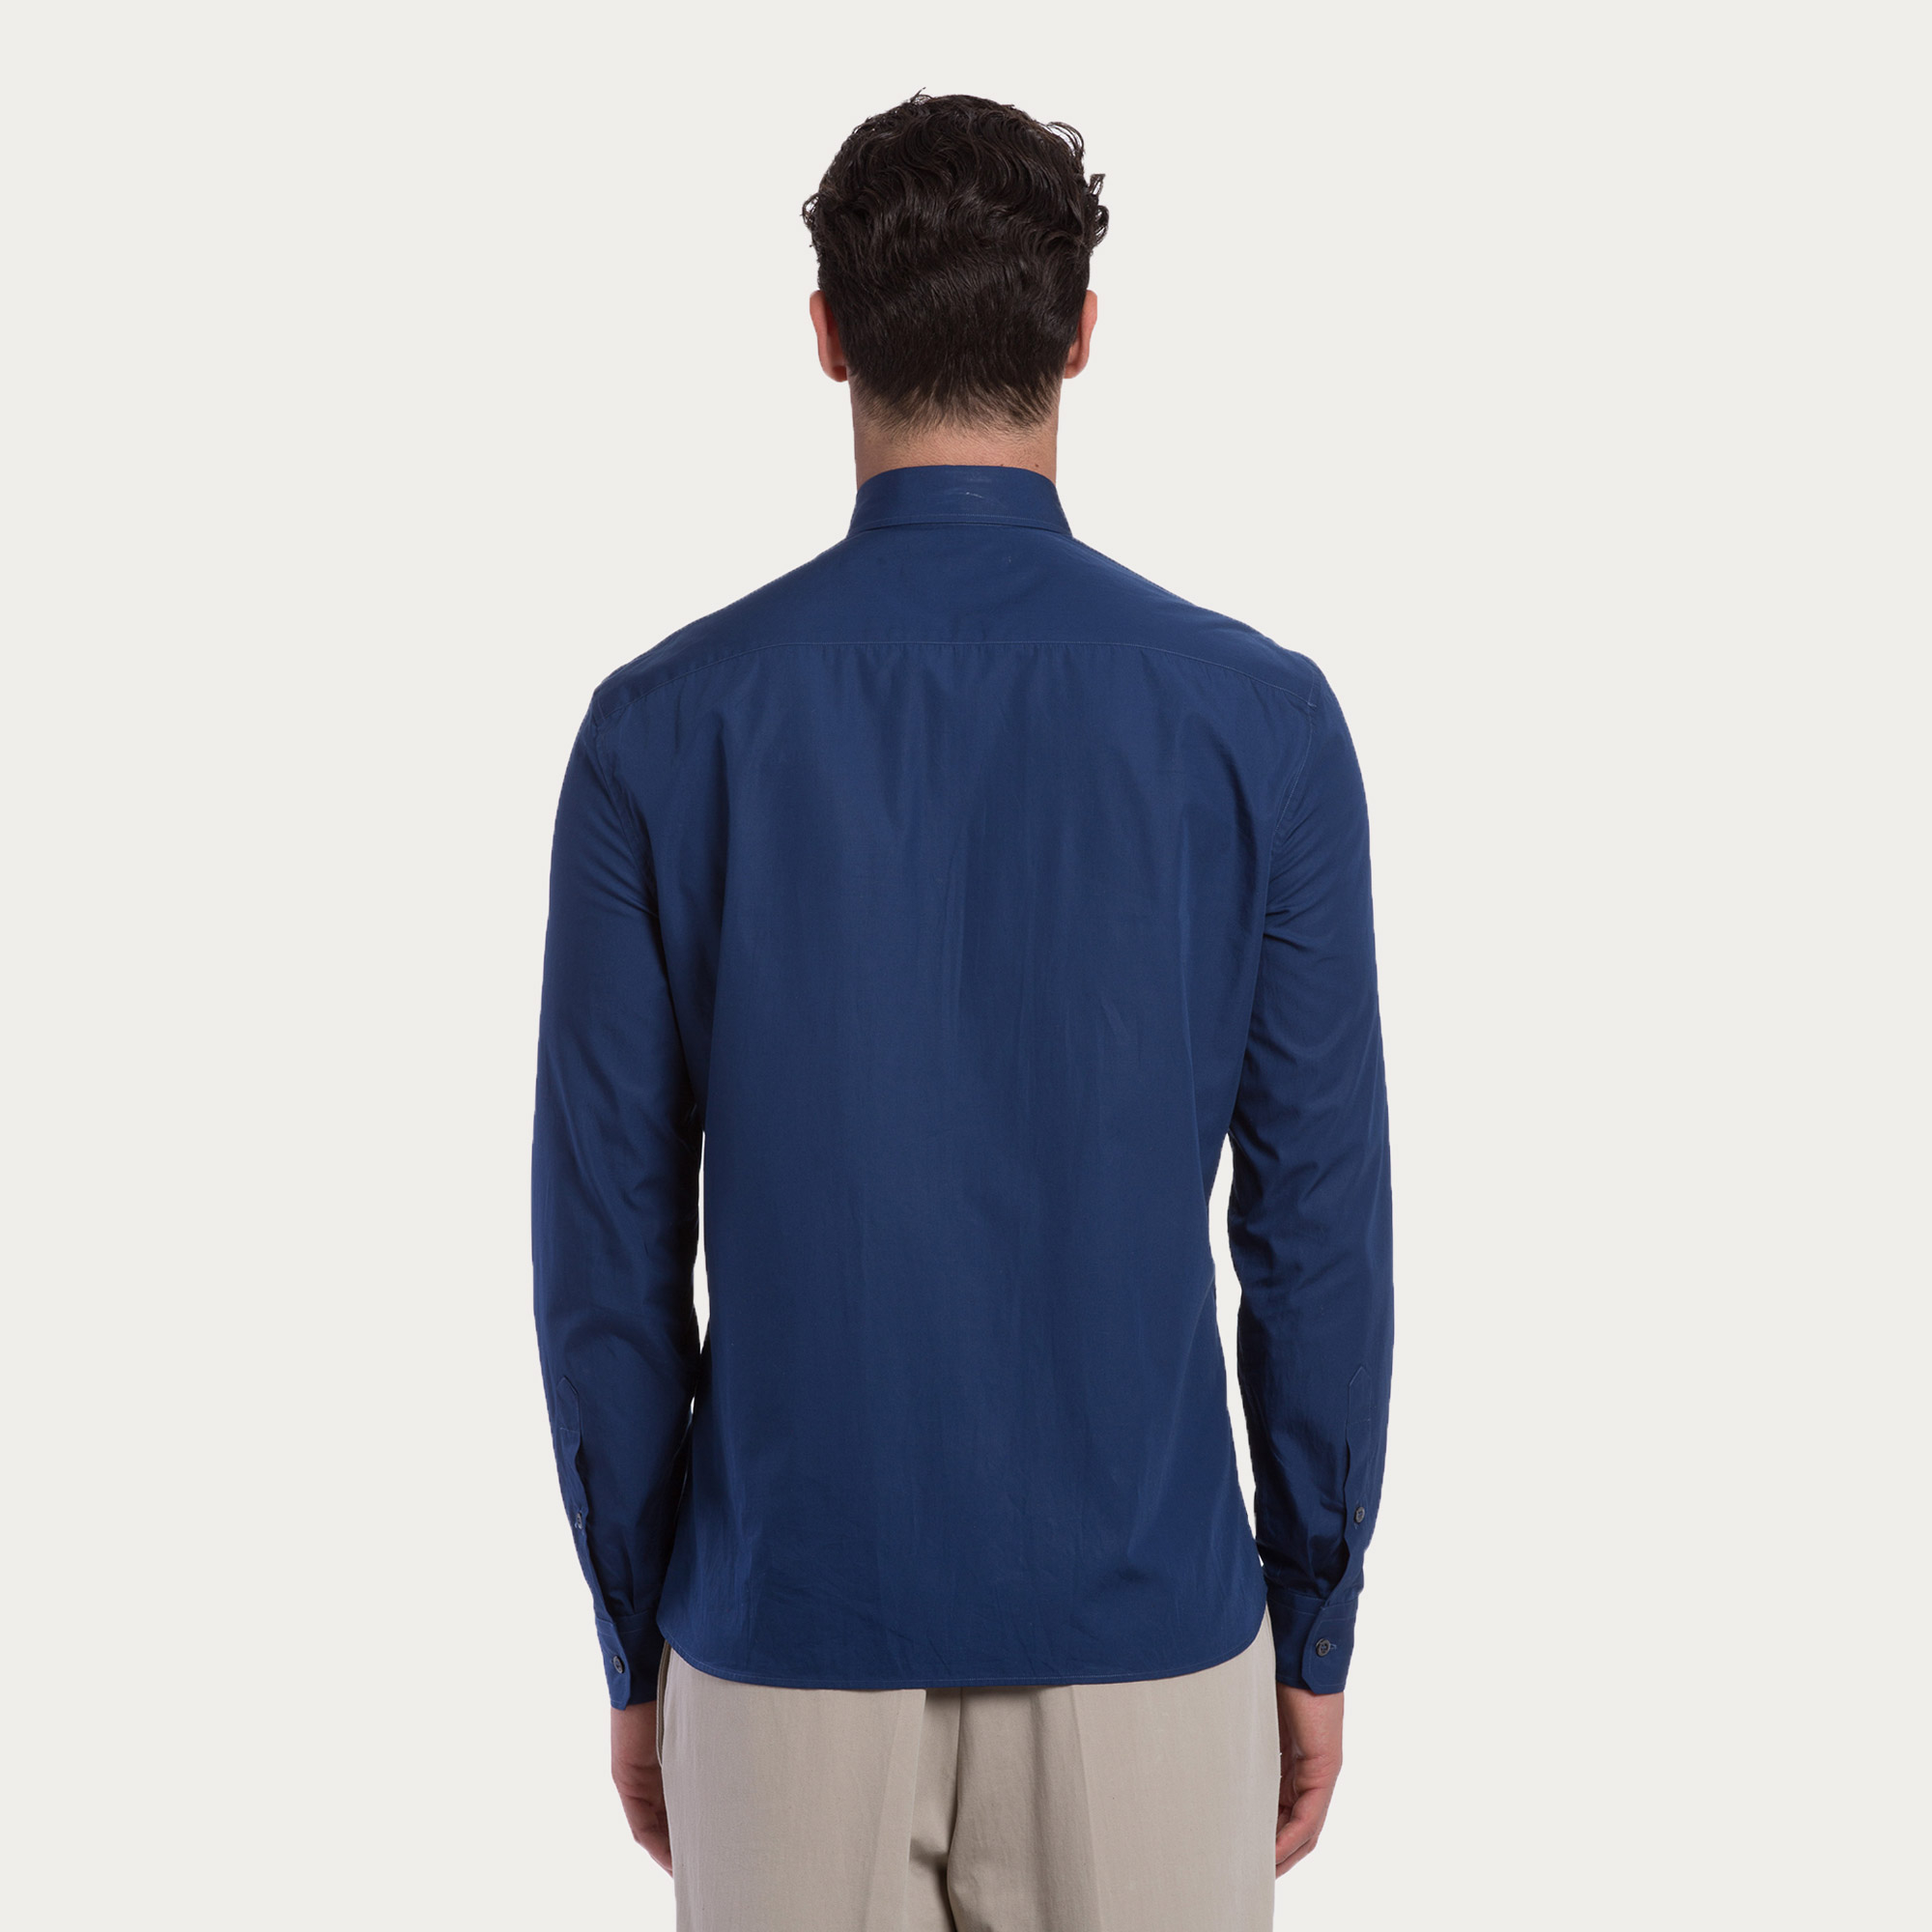 Bally Cotton Poplin Shirt In Blue For Men Lyst